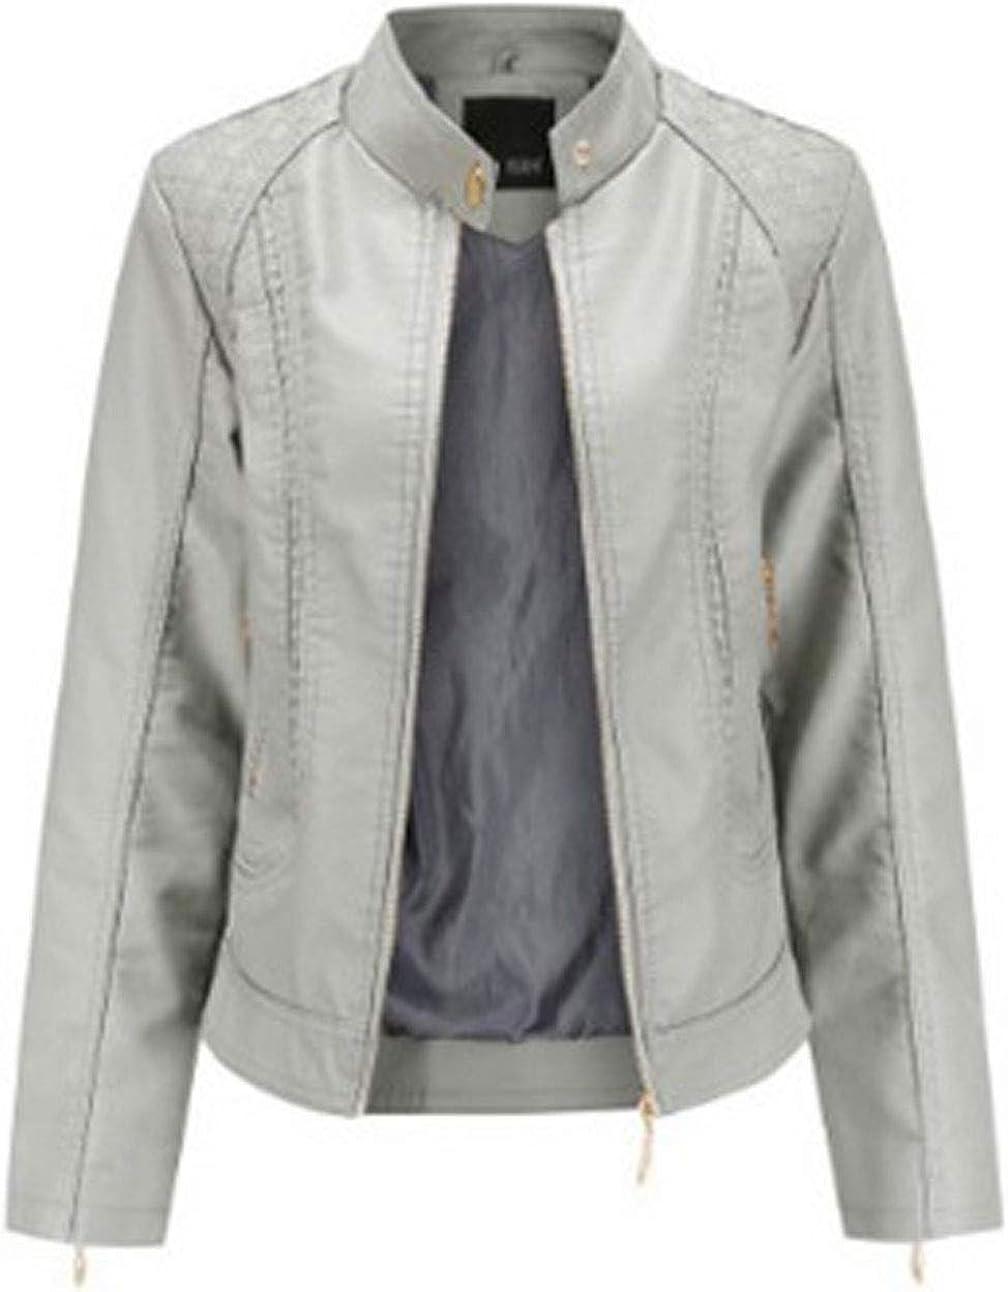 chouyatou Women's Banded Collar Zip Up Lightweight Quilted Pattern Pu Leather Biker Jacket